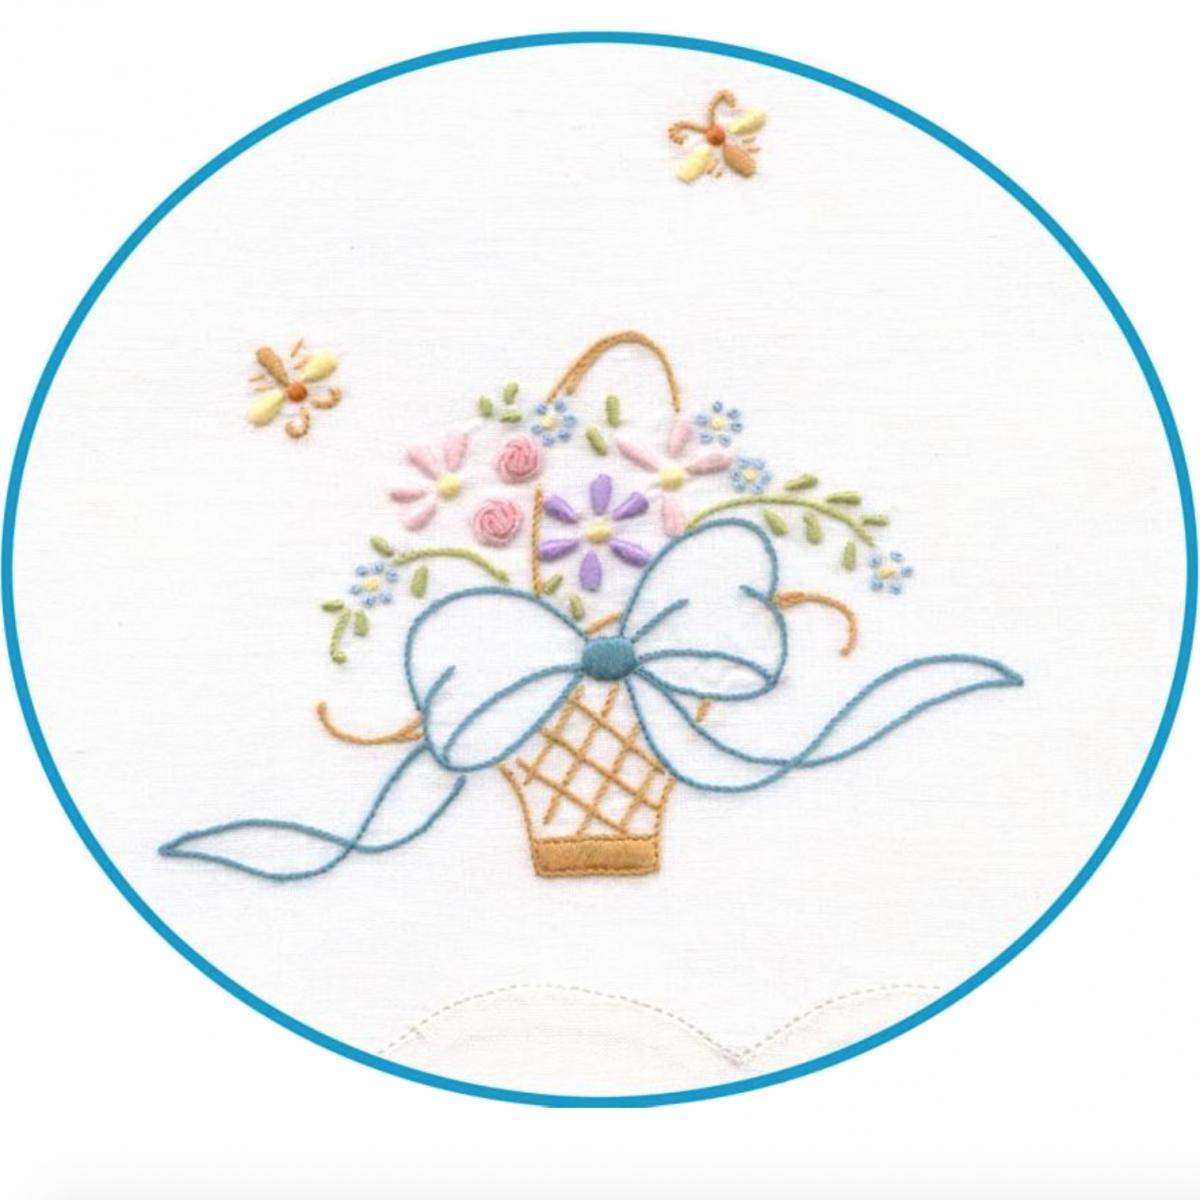 Madeira Embroidered Tea Towel